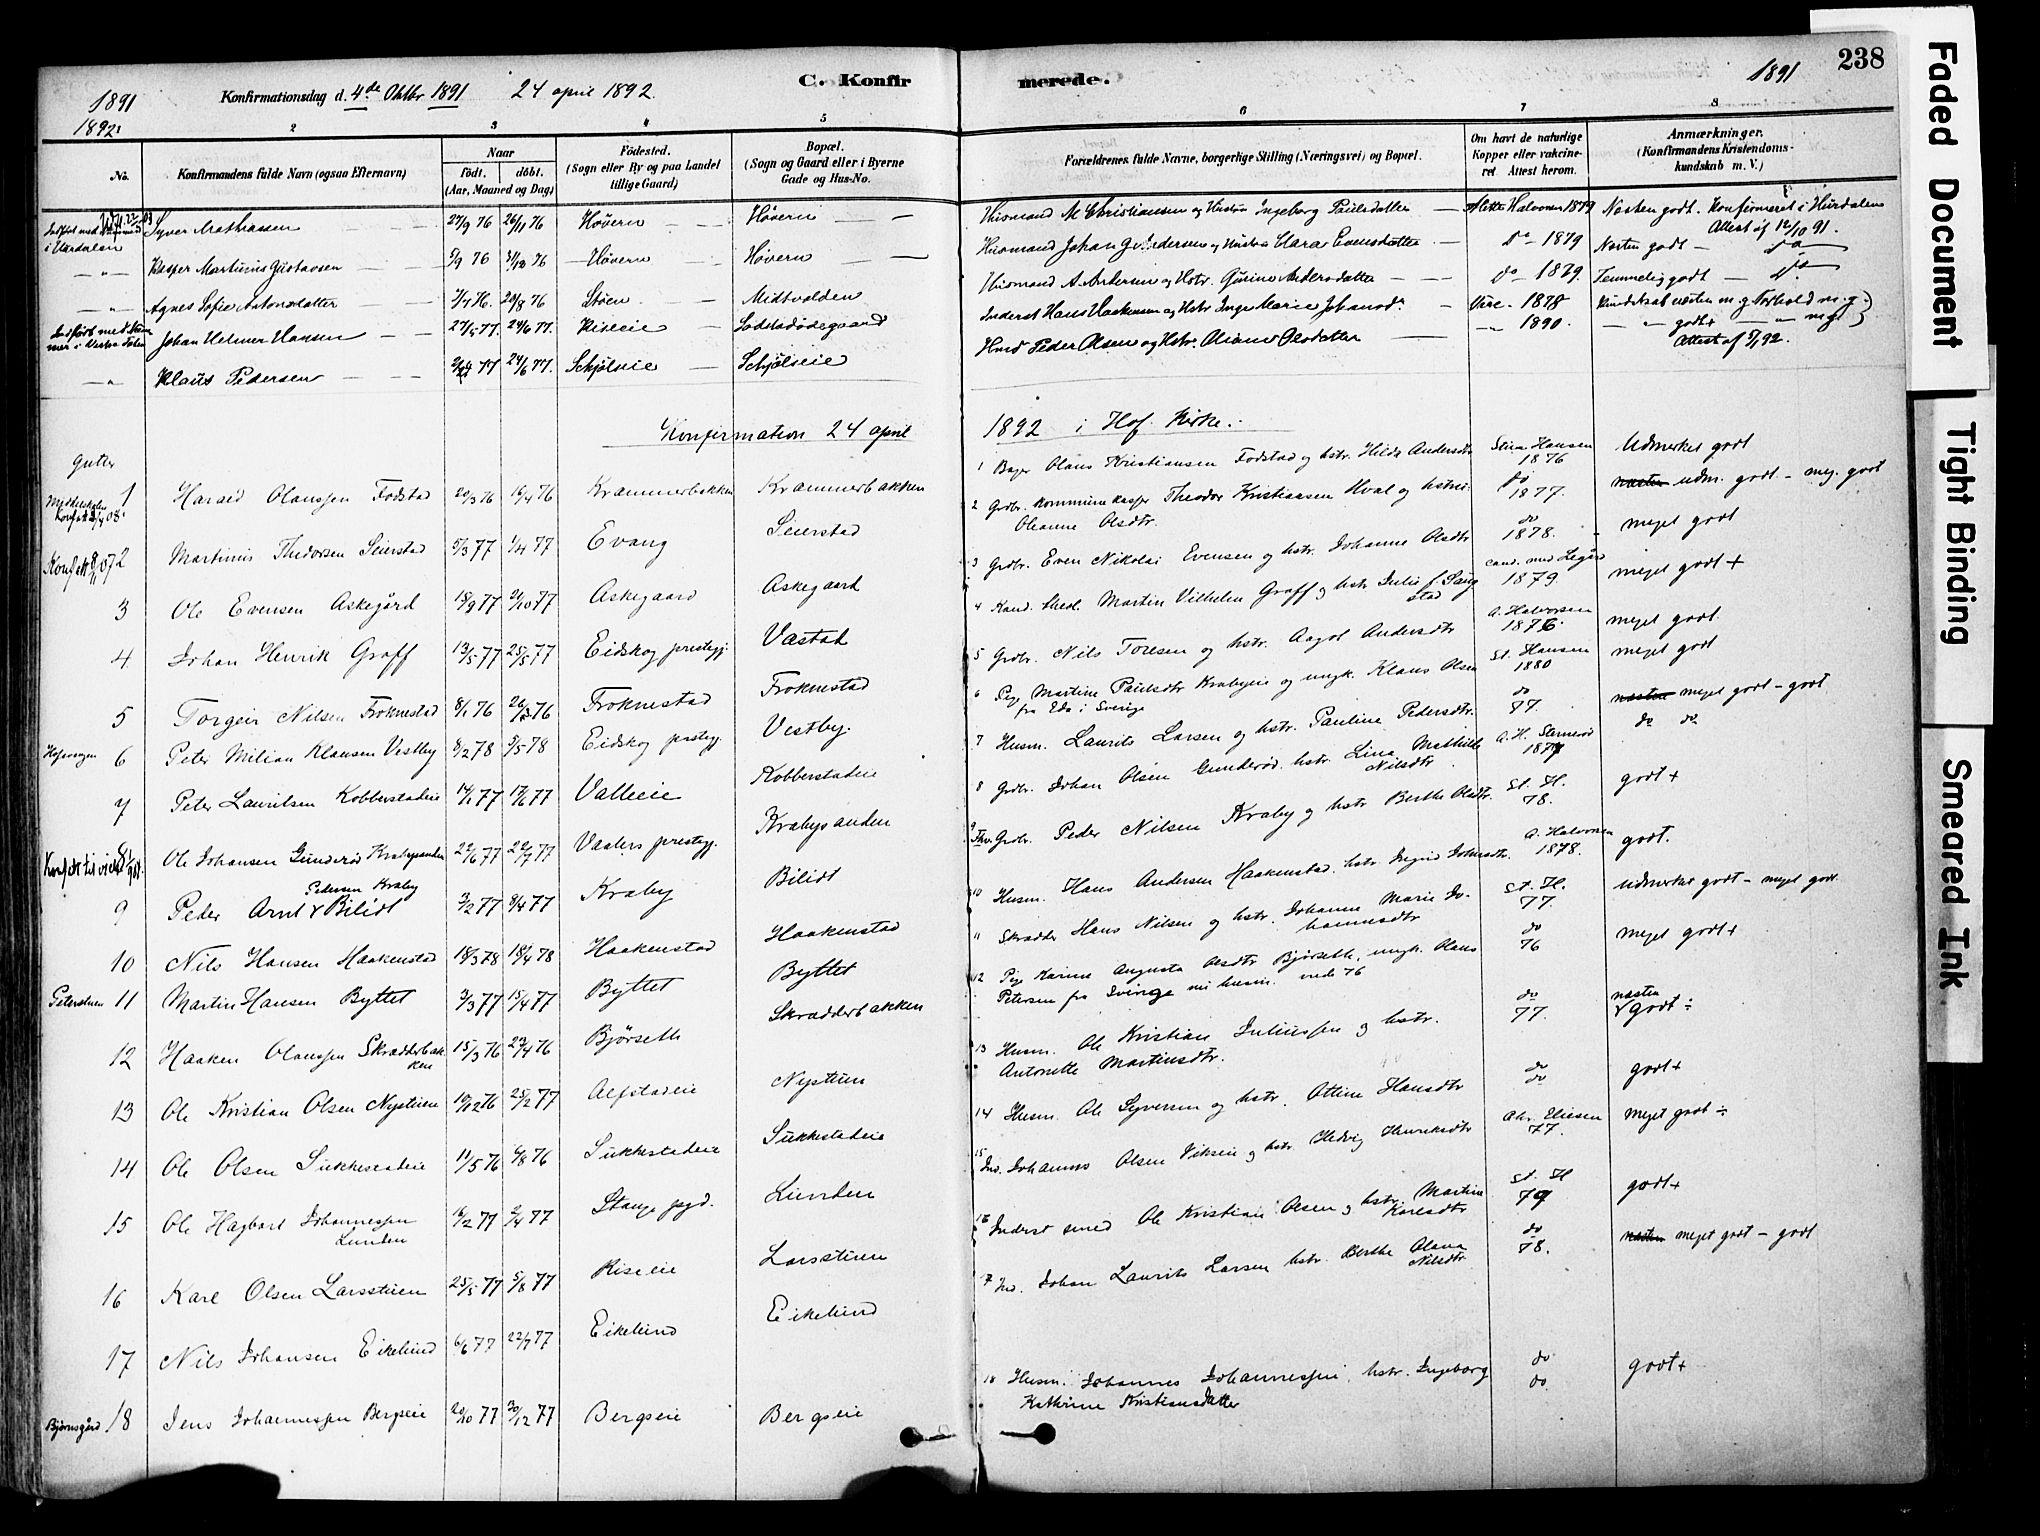 SAH, Østre Toten prestekontor, Ministerialbok nr. 6 /1, 1878-1896, s. 238